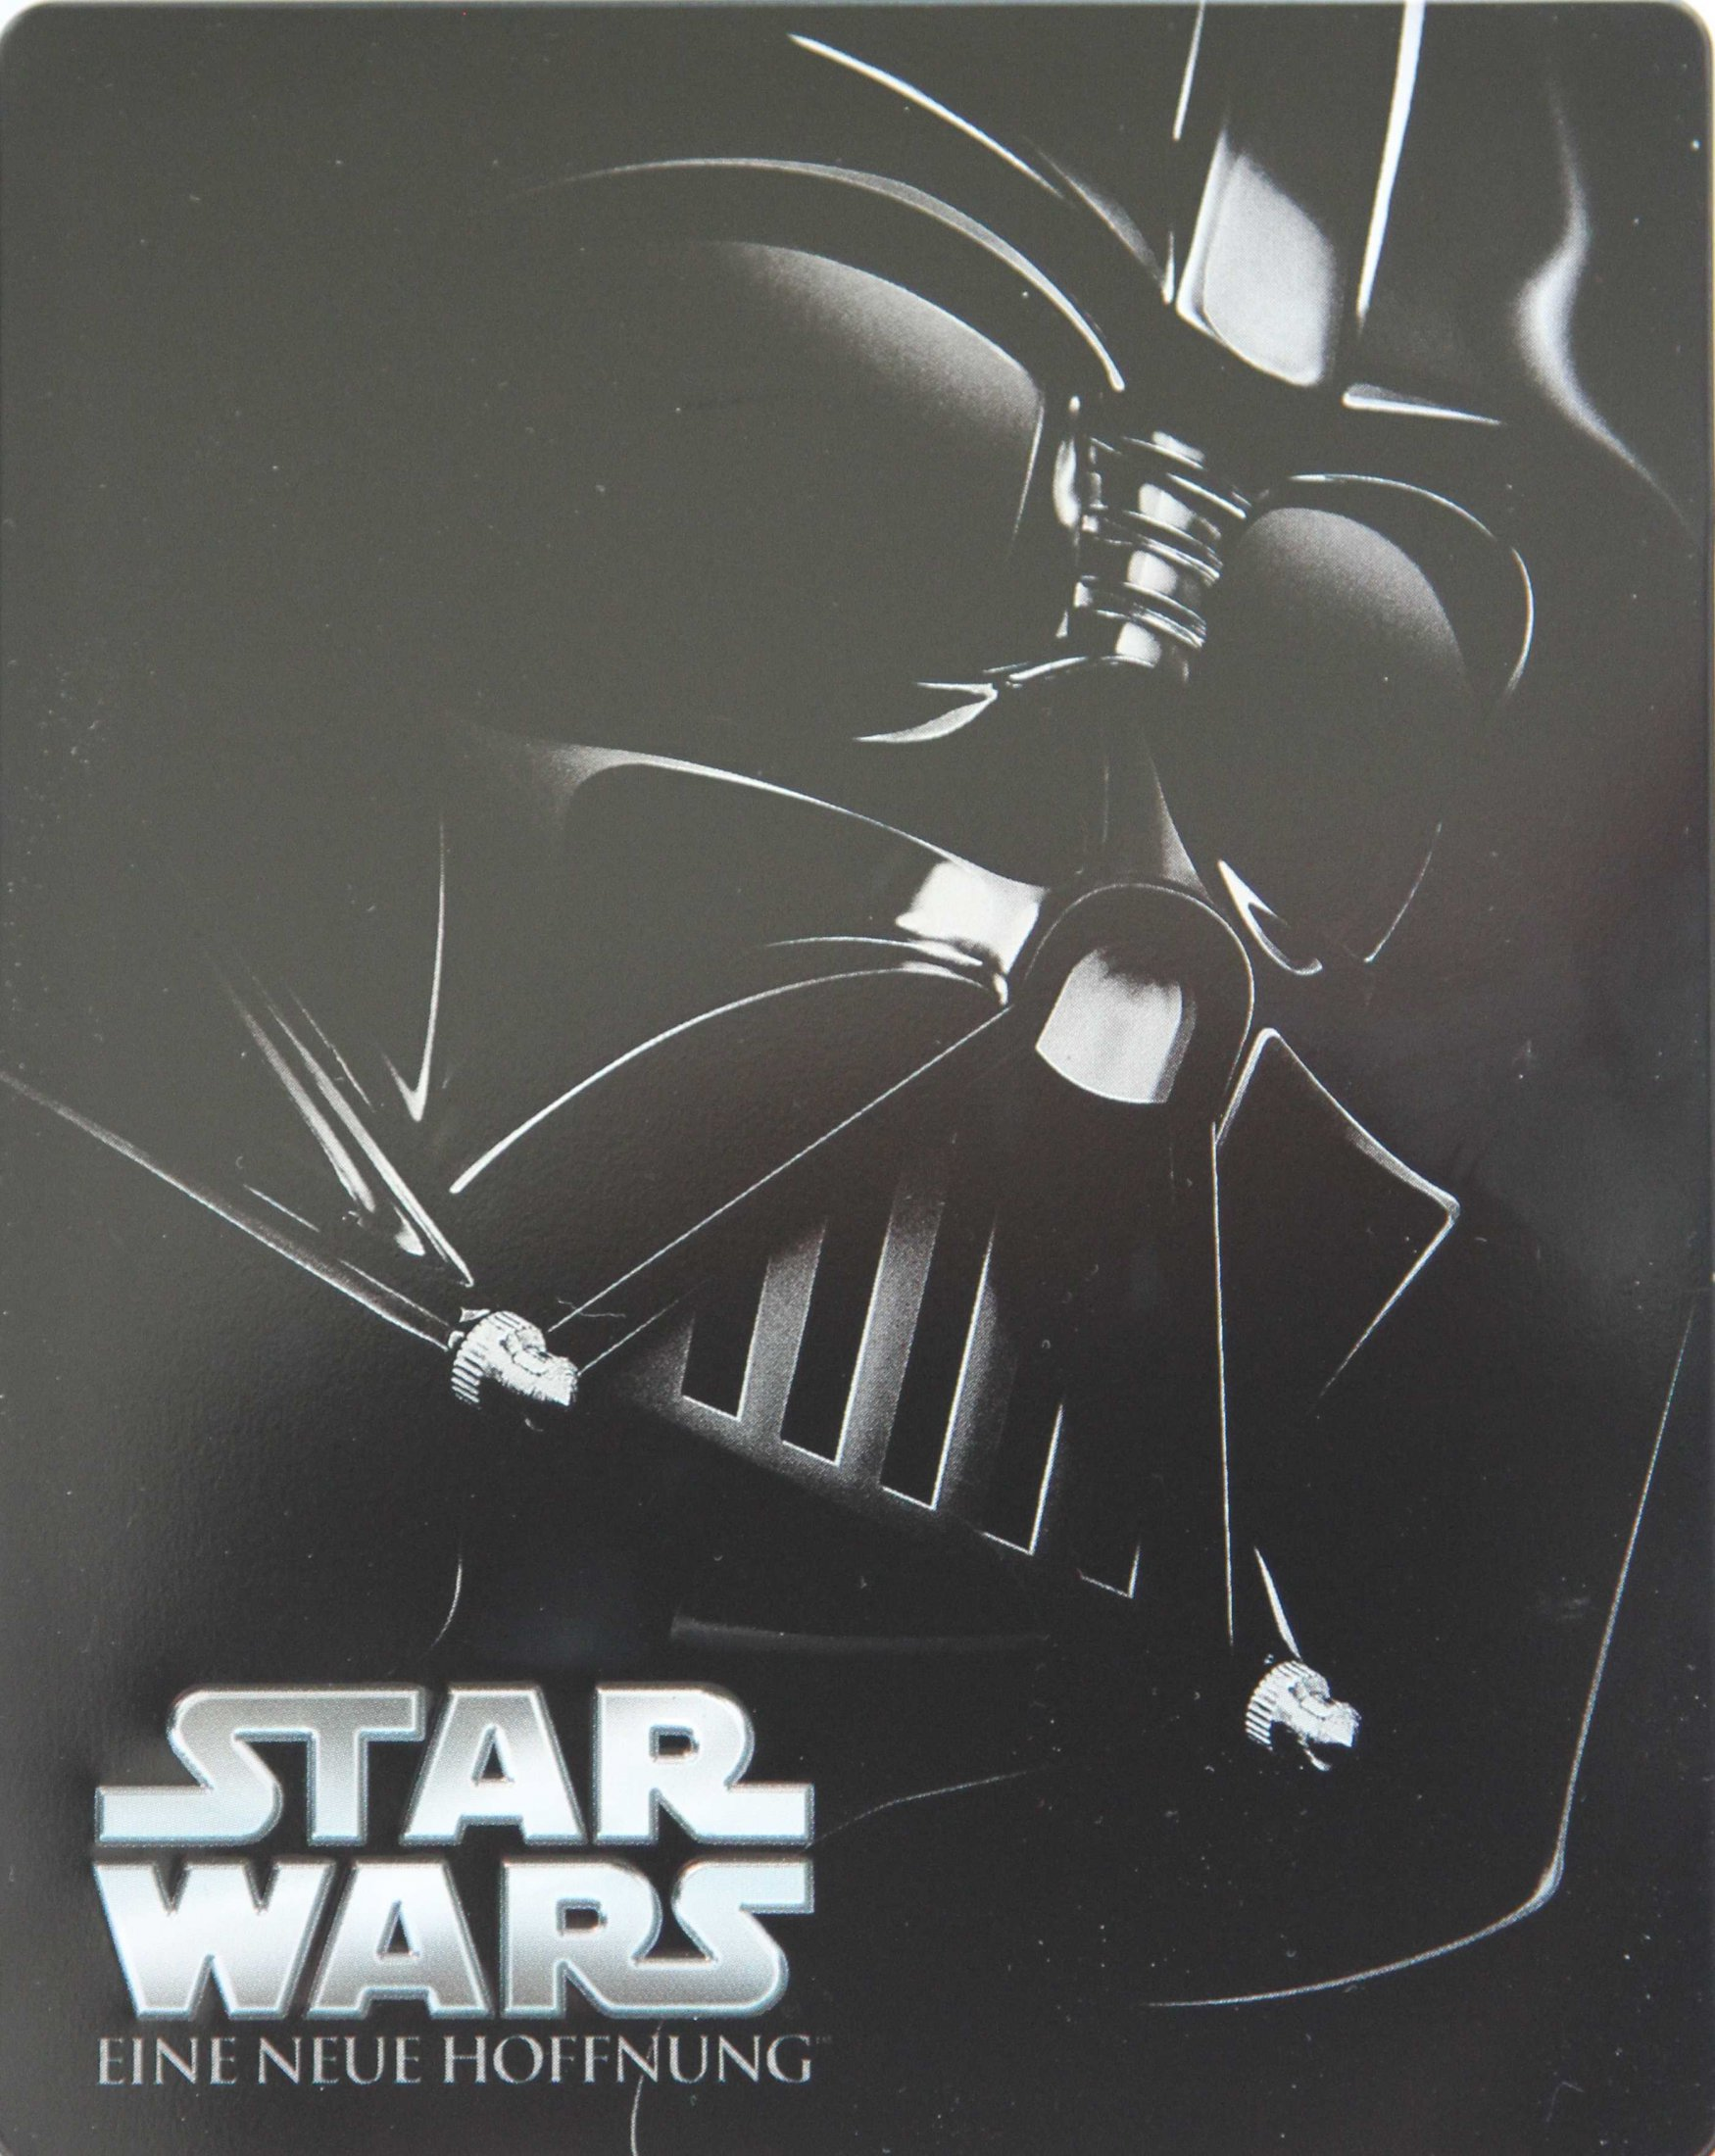 Star Wars IV Front